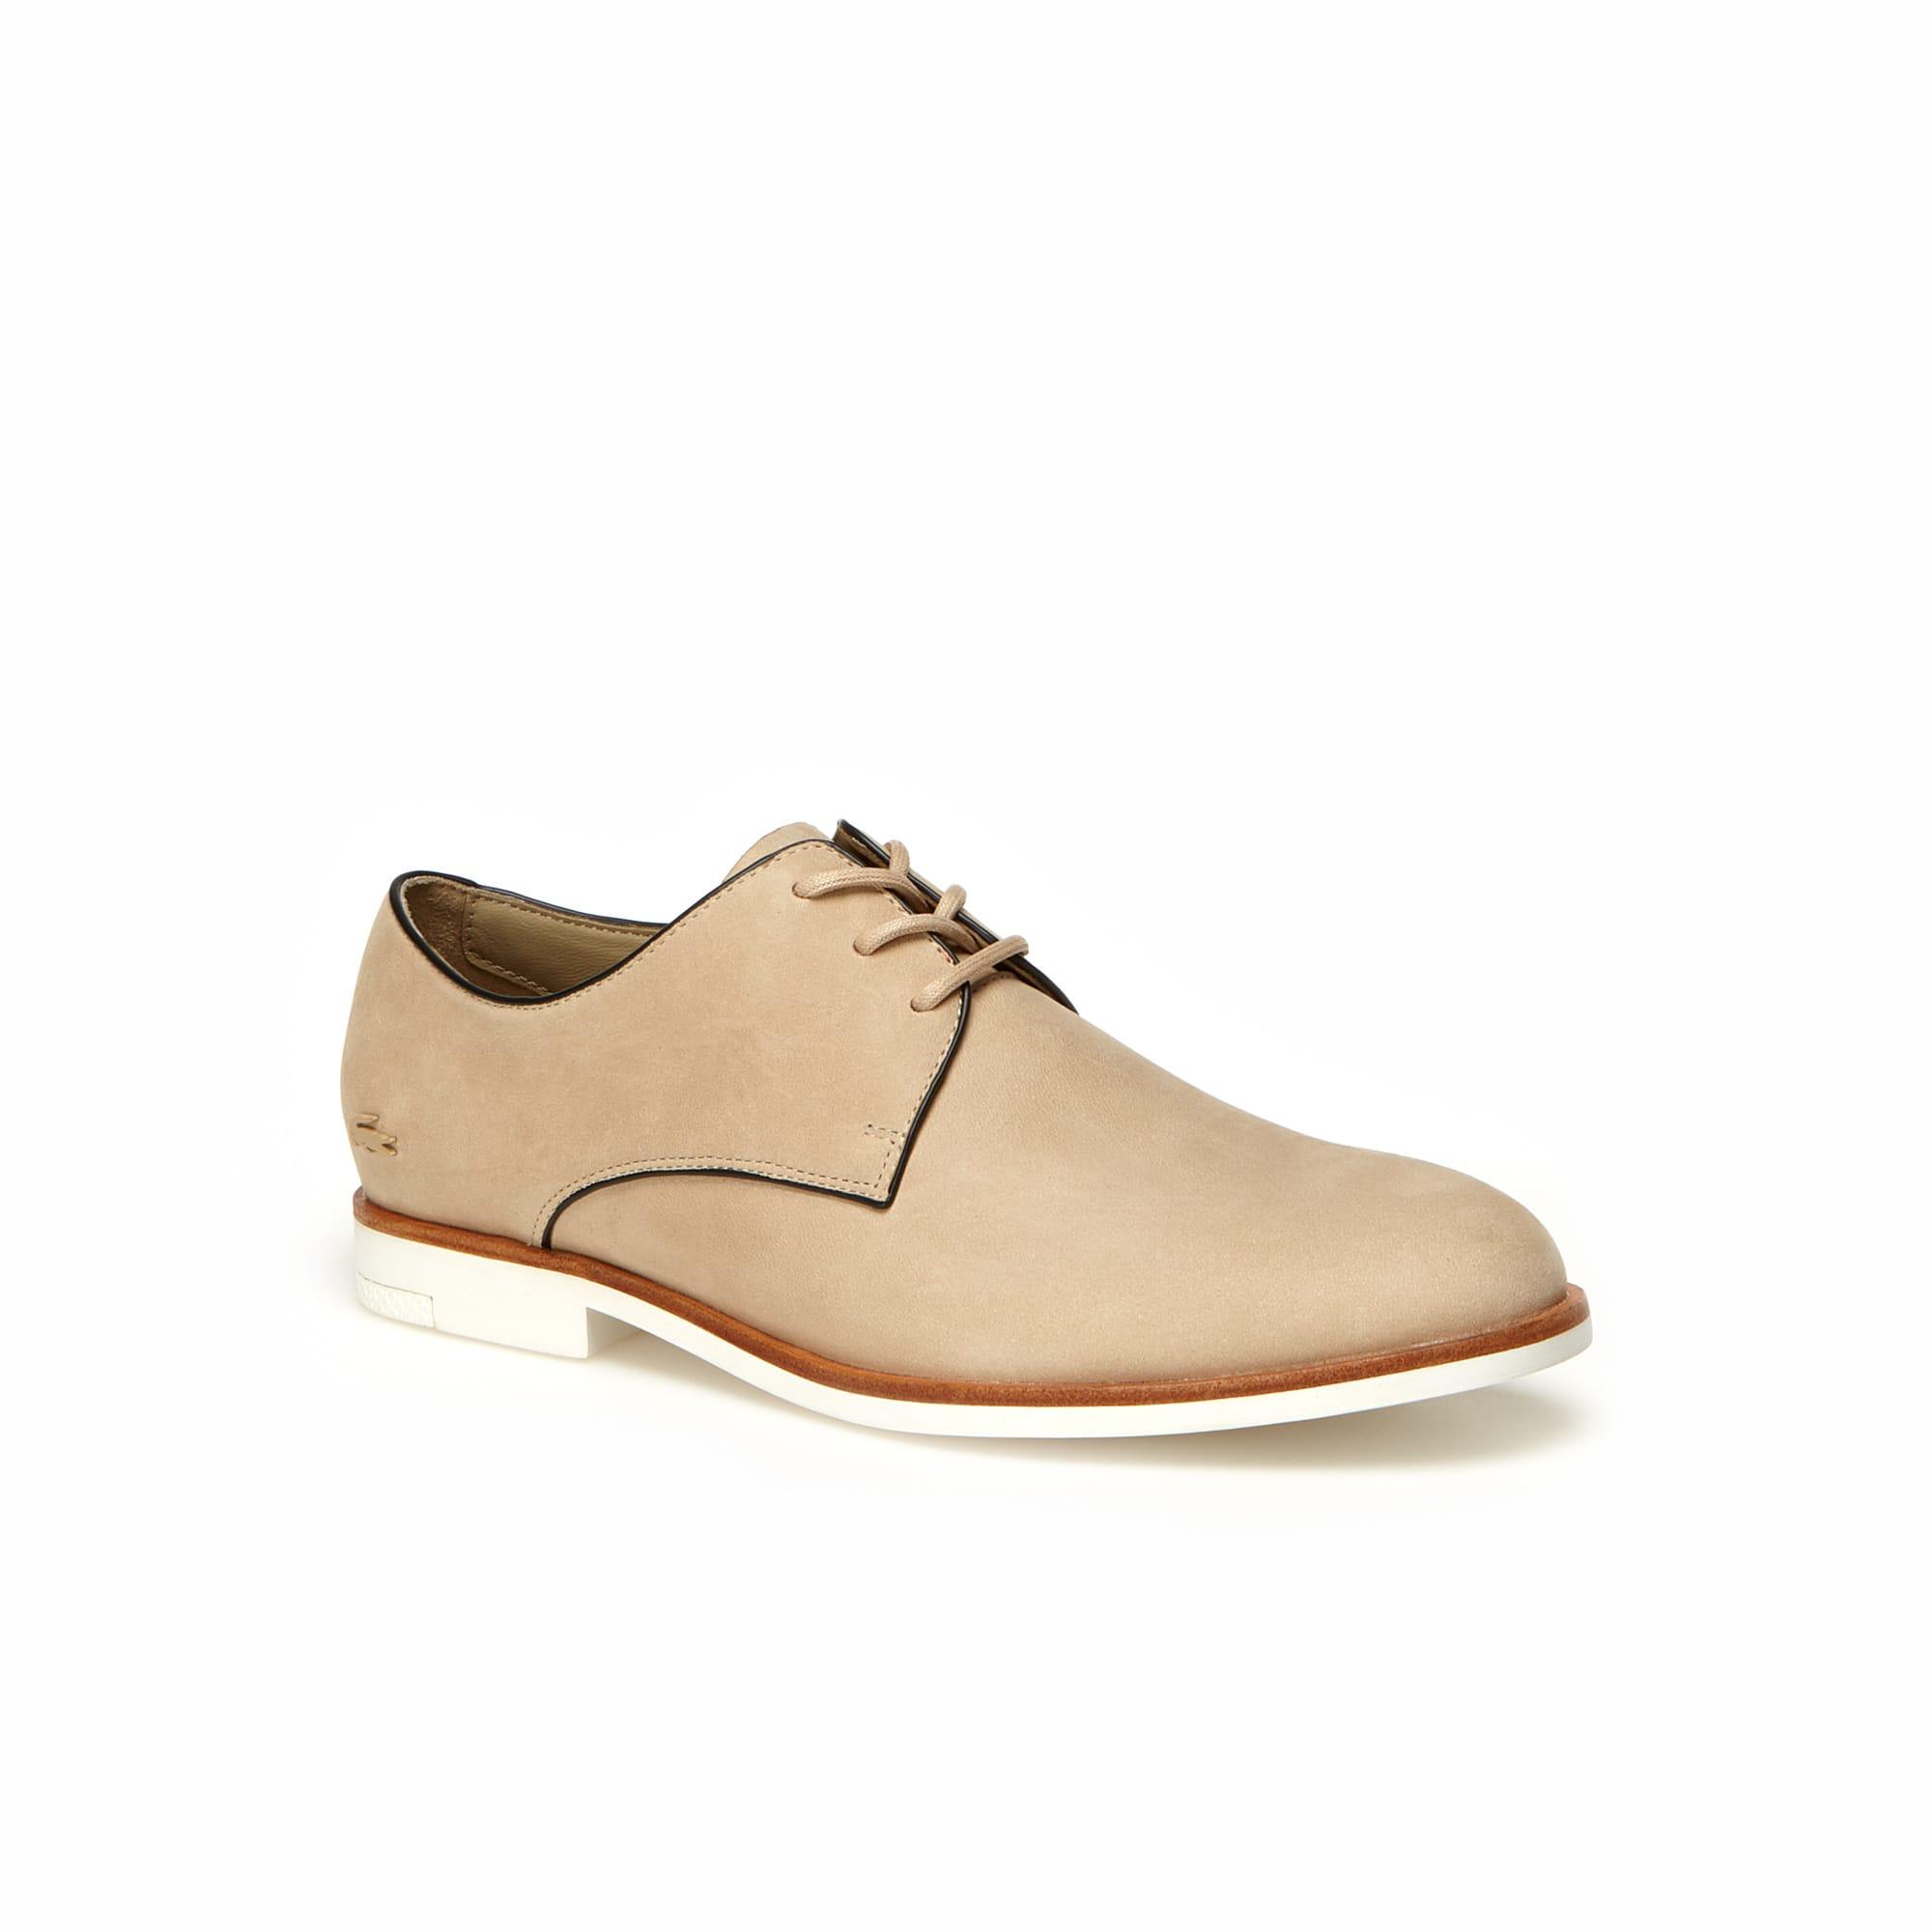 Women's Cambrai Suede Derby Shoes